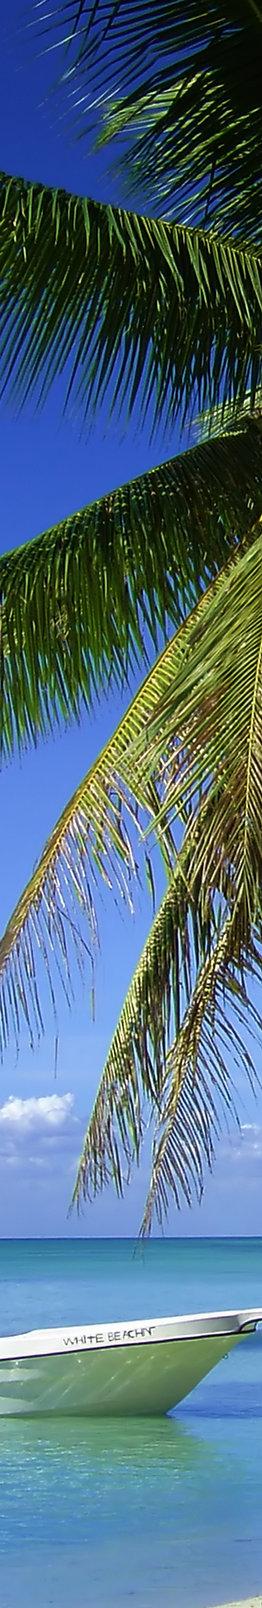 Playa de Bocas del Toro.jpg